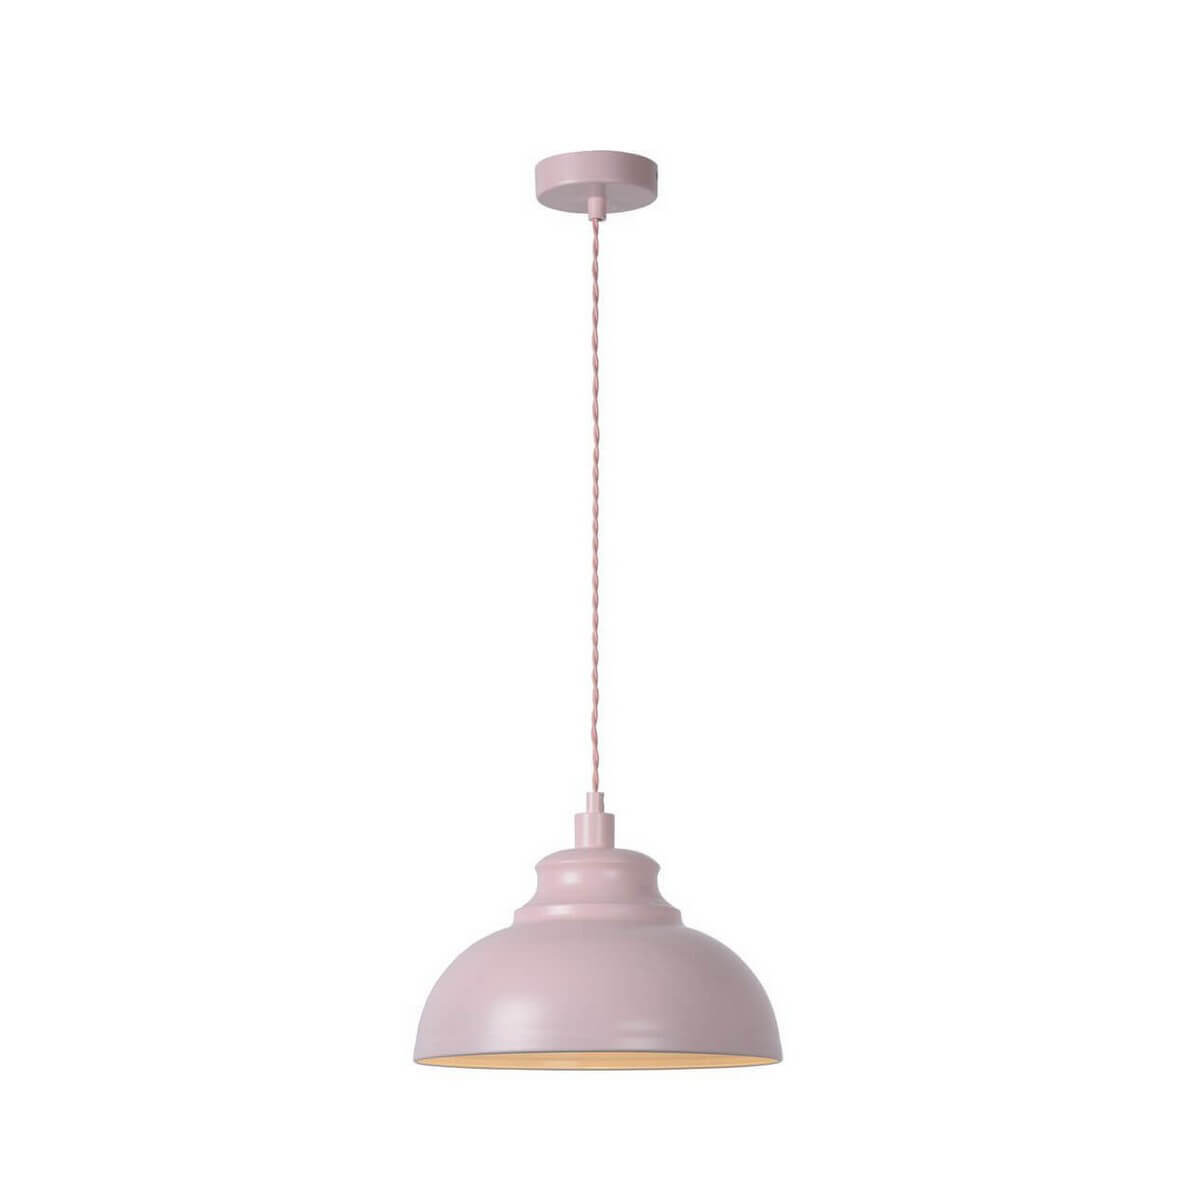 Подвесной светильник Lucide Isla 34400/29/66 цена и фото